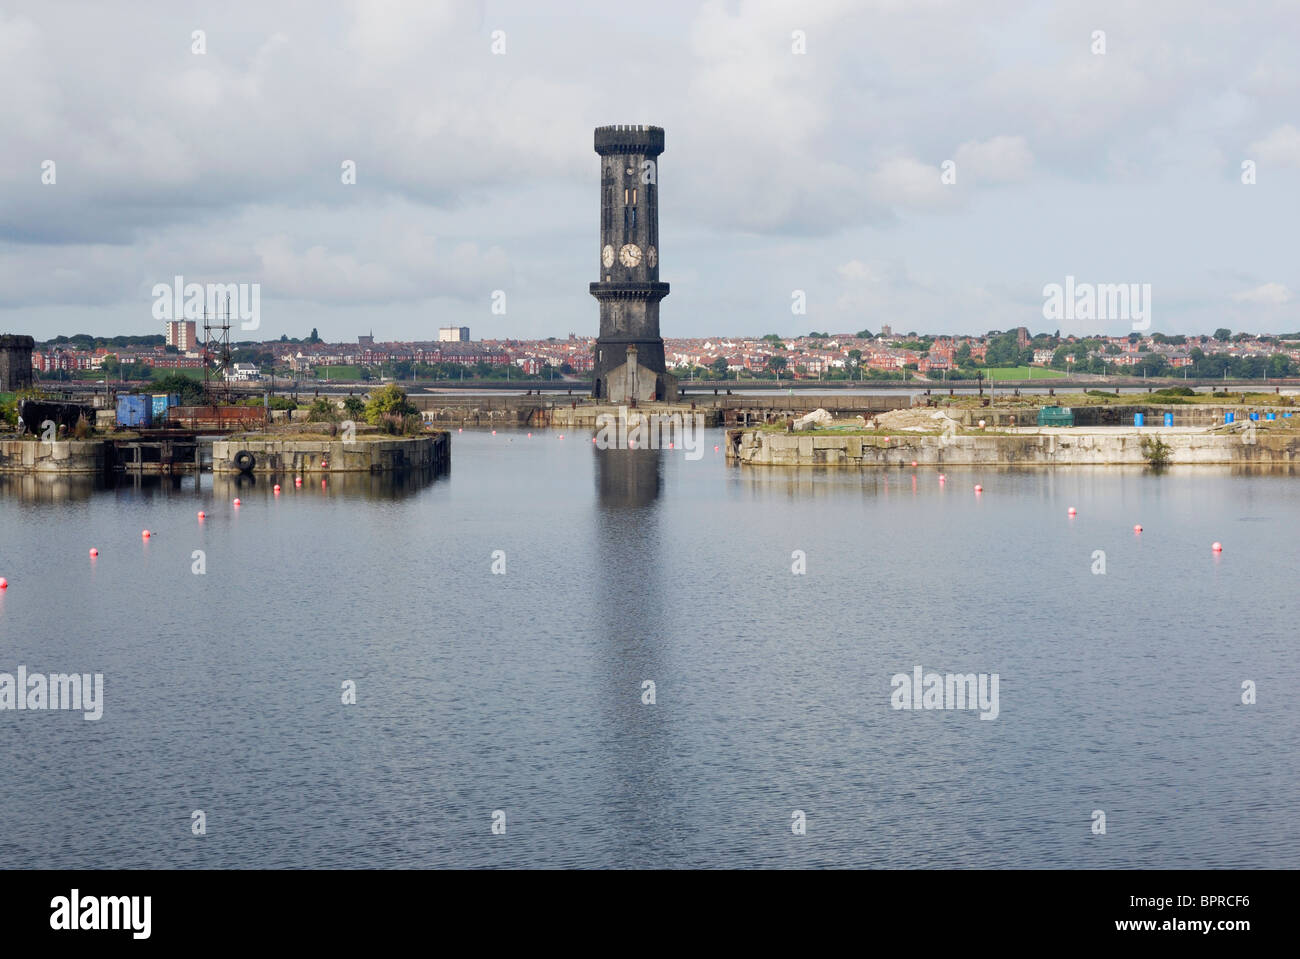 Jesse Hartley's hexagonal clock tower in Liverpool Docks with Birkenhead / Wallasy in background. - Stock Image